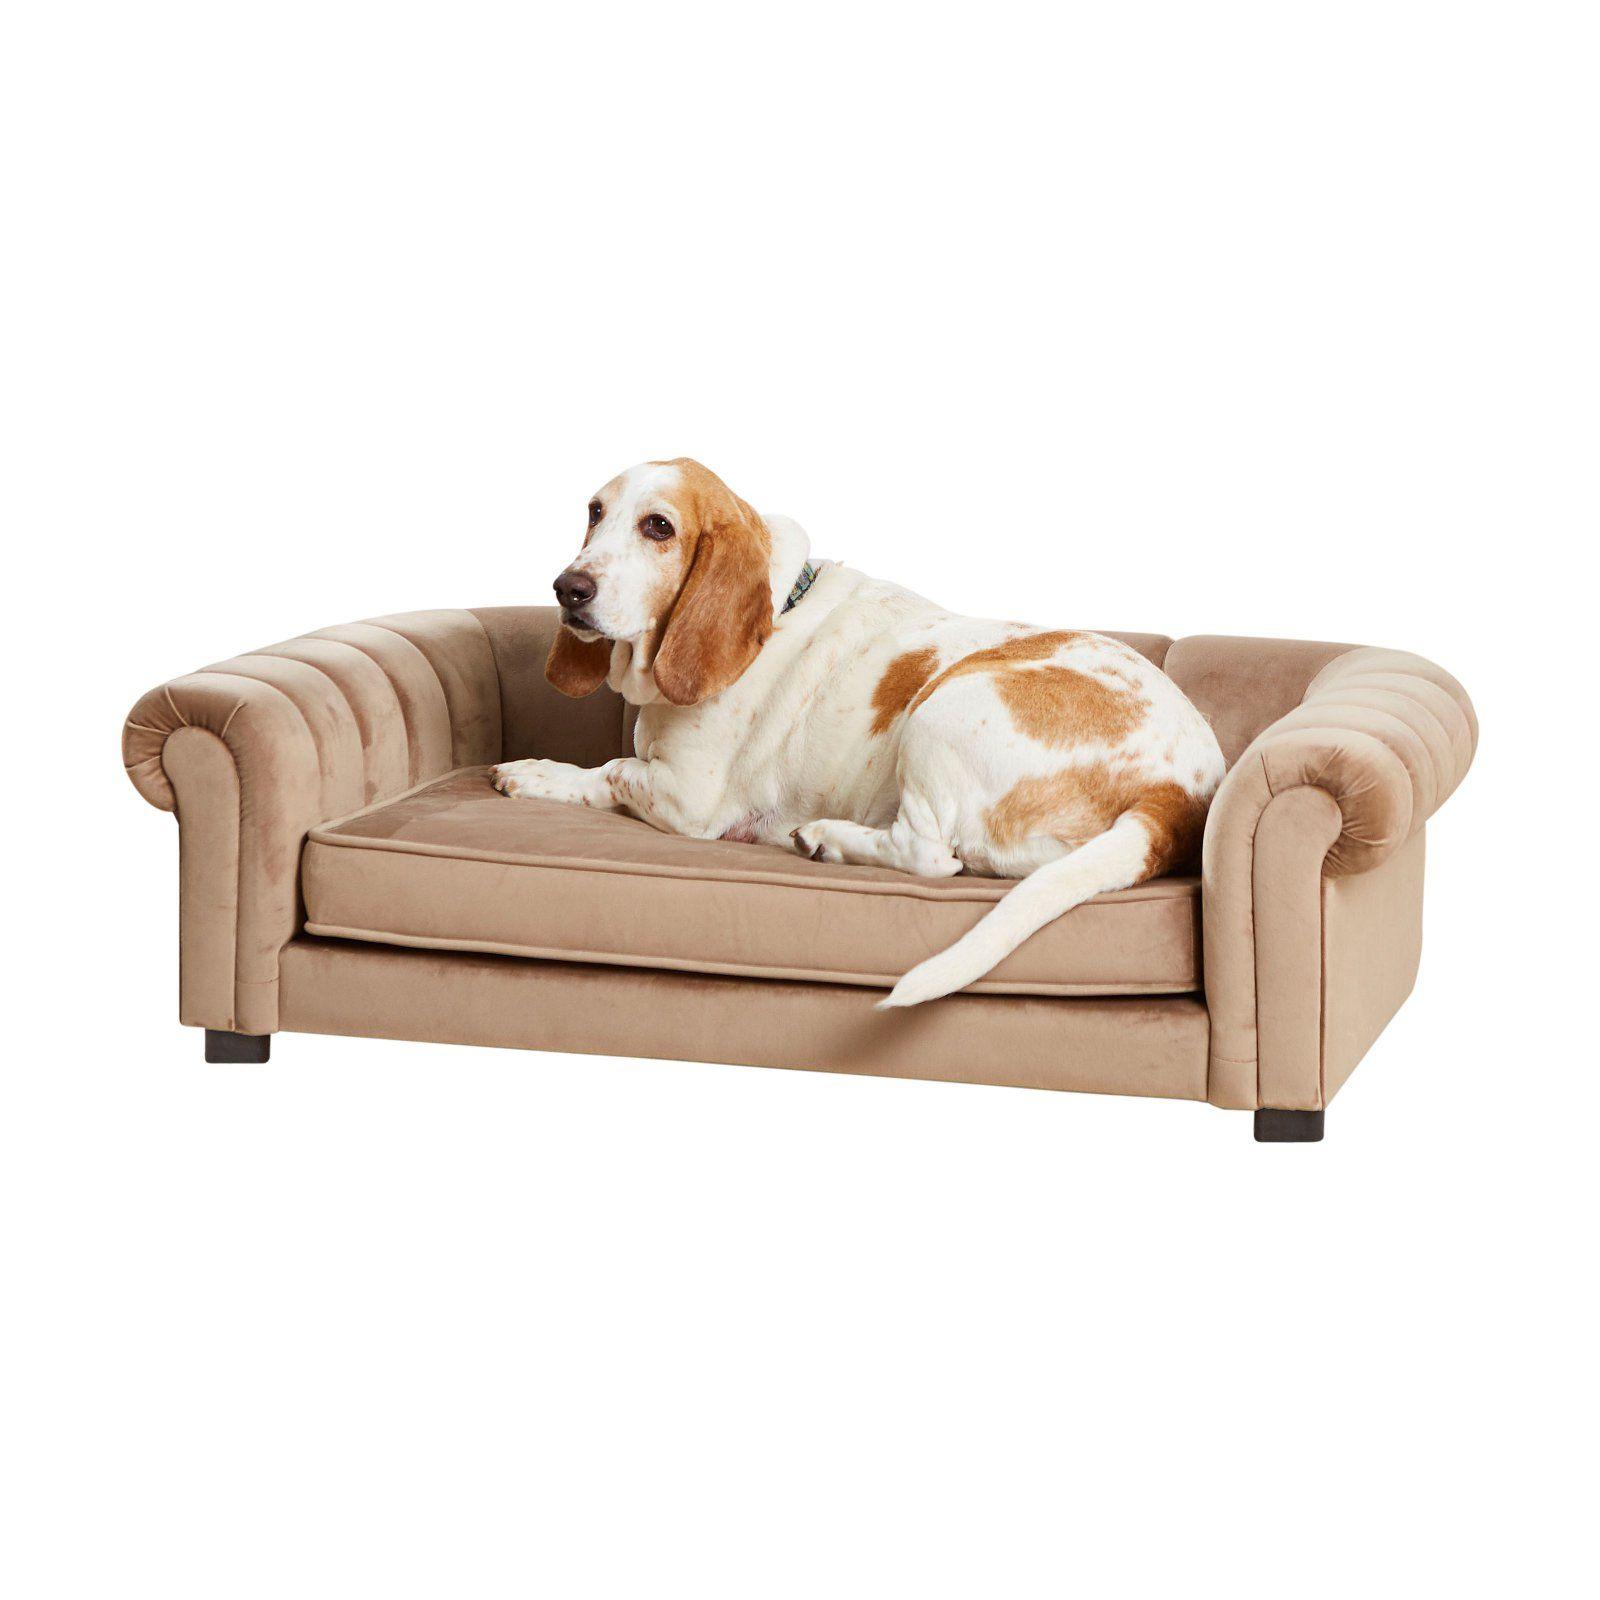 Enchanted Home Pet Sullivan Pet Sofa Pet beds, Pets, Bed